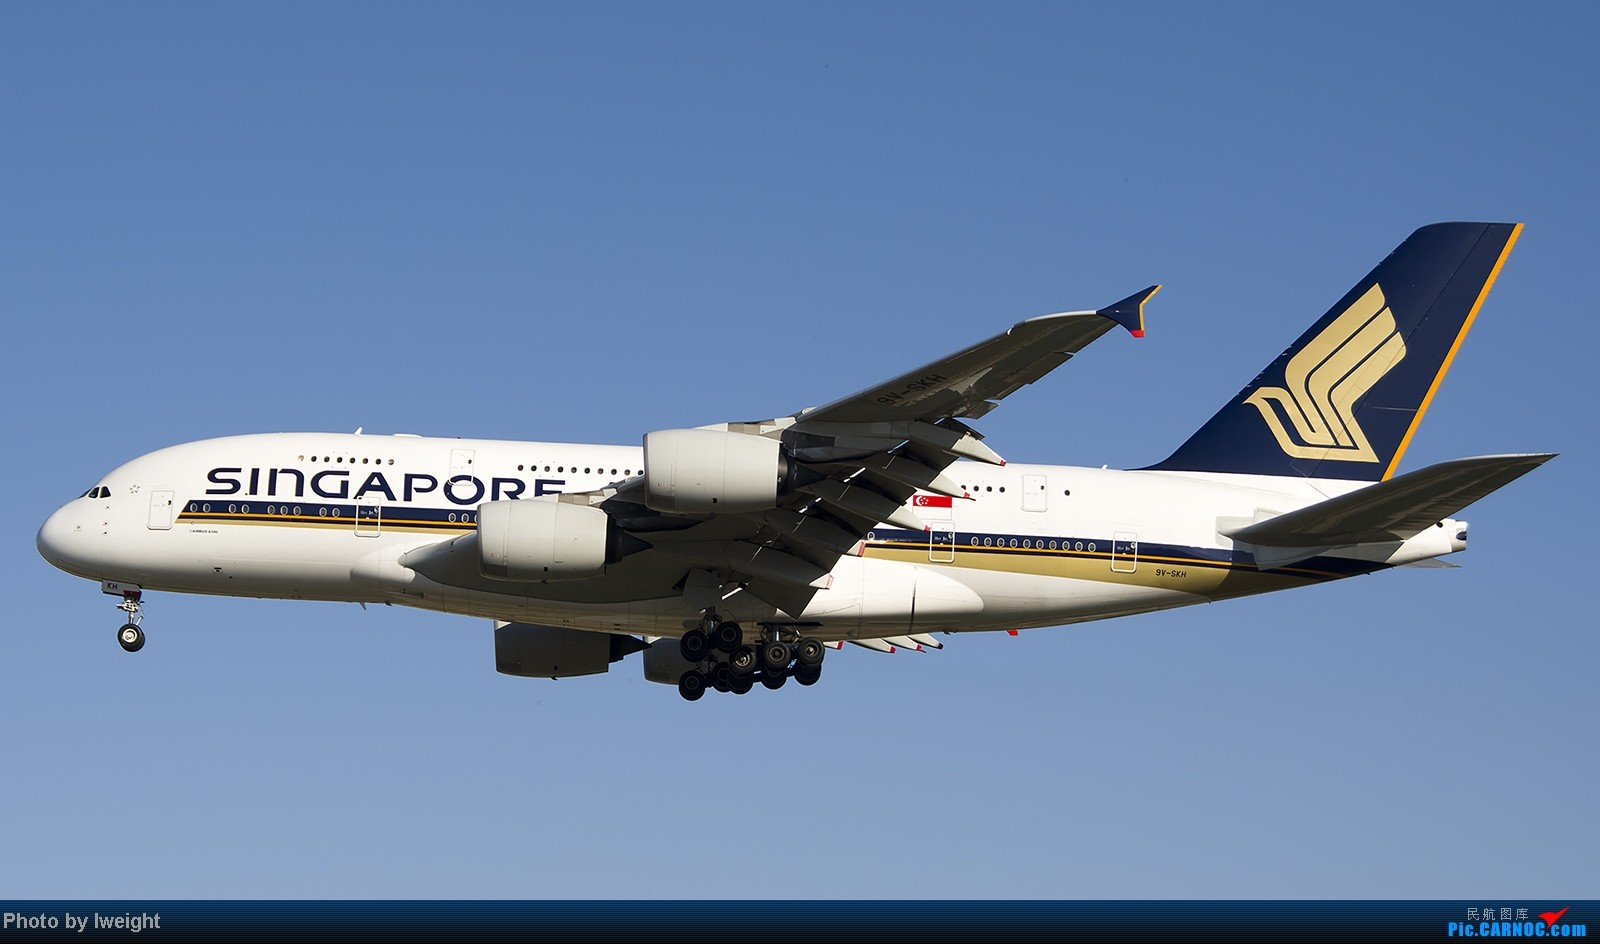 Re:[原创]终于盼来了晴天,PEK拍起【10月26日】 AIRBUS A380-800 9V-SKH 中国北京首都机场